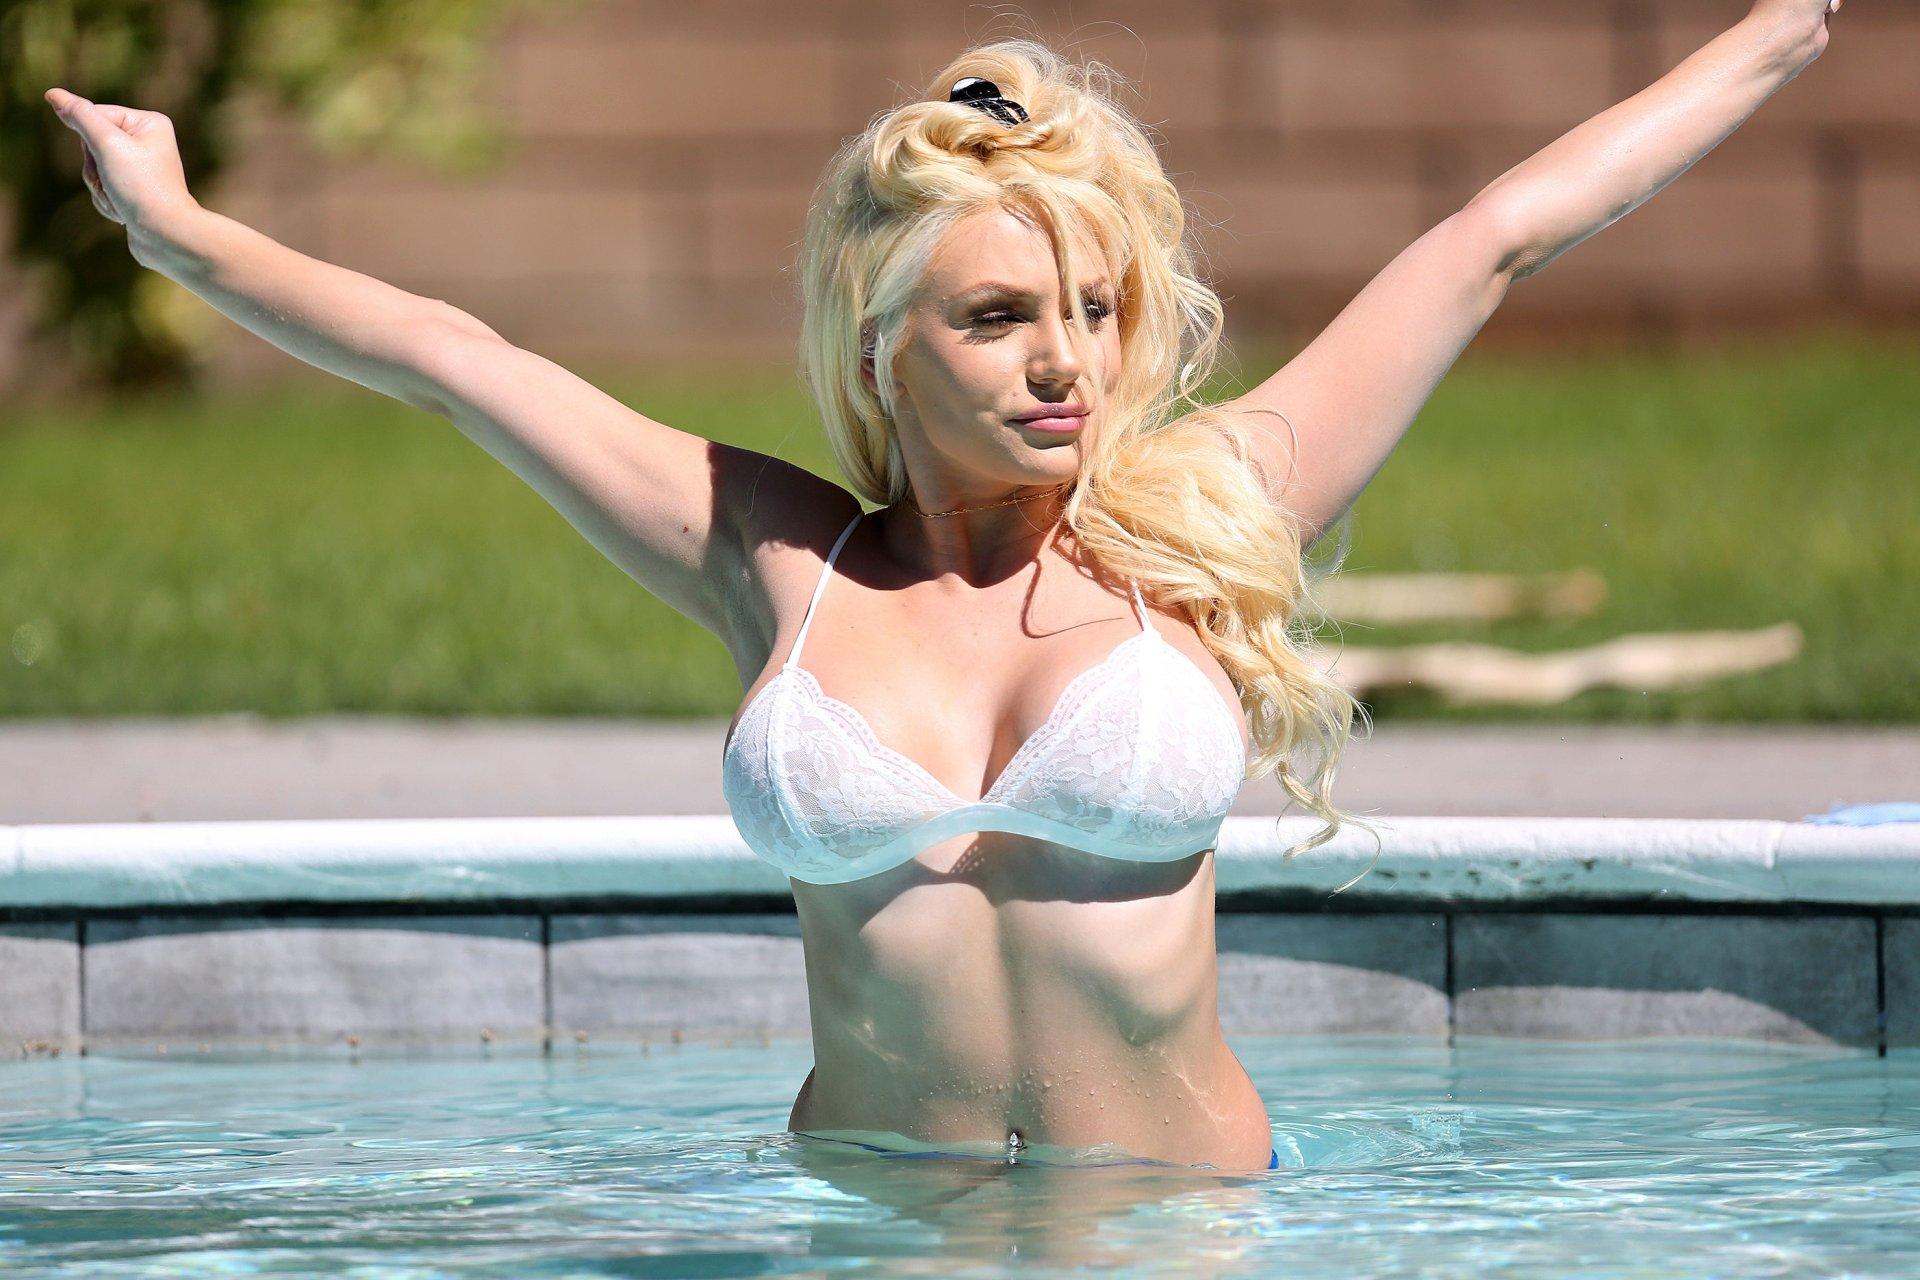 Courtney-Stodden-Sexy-TheFappeningBlog.com-25.jpg